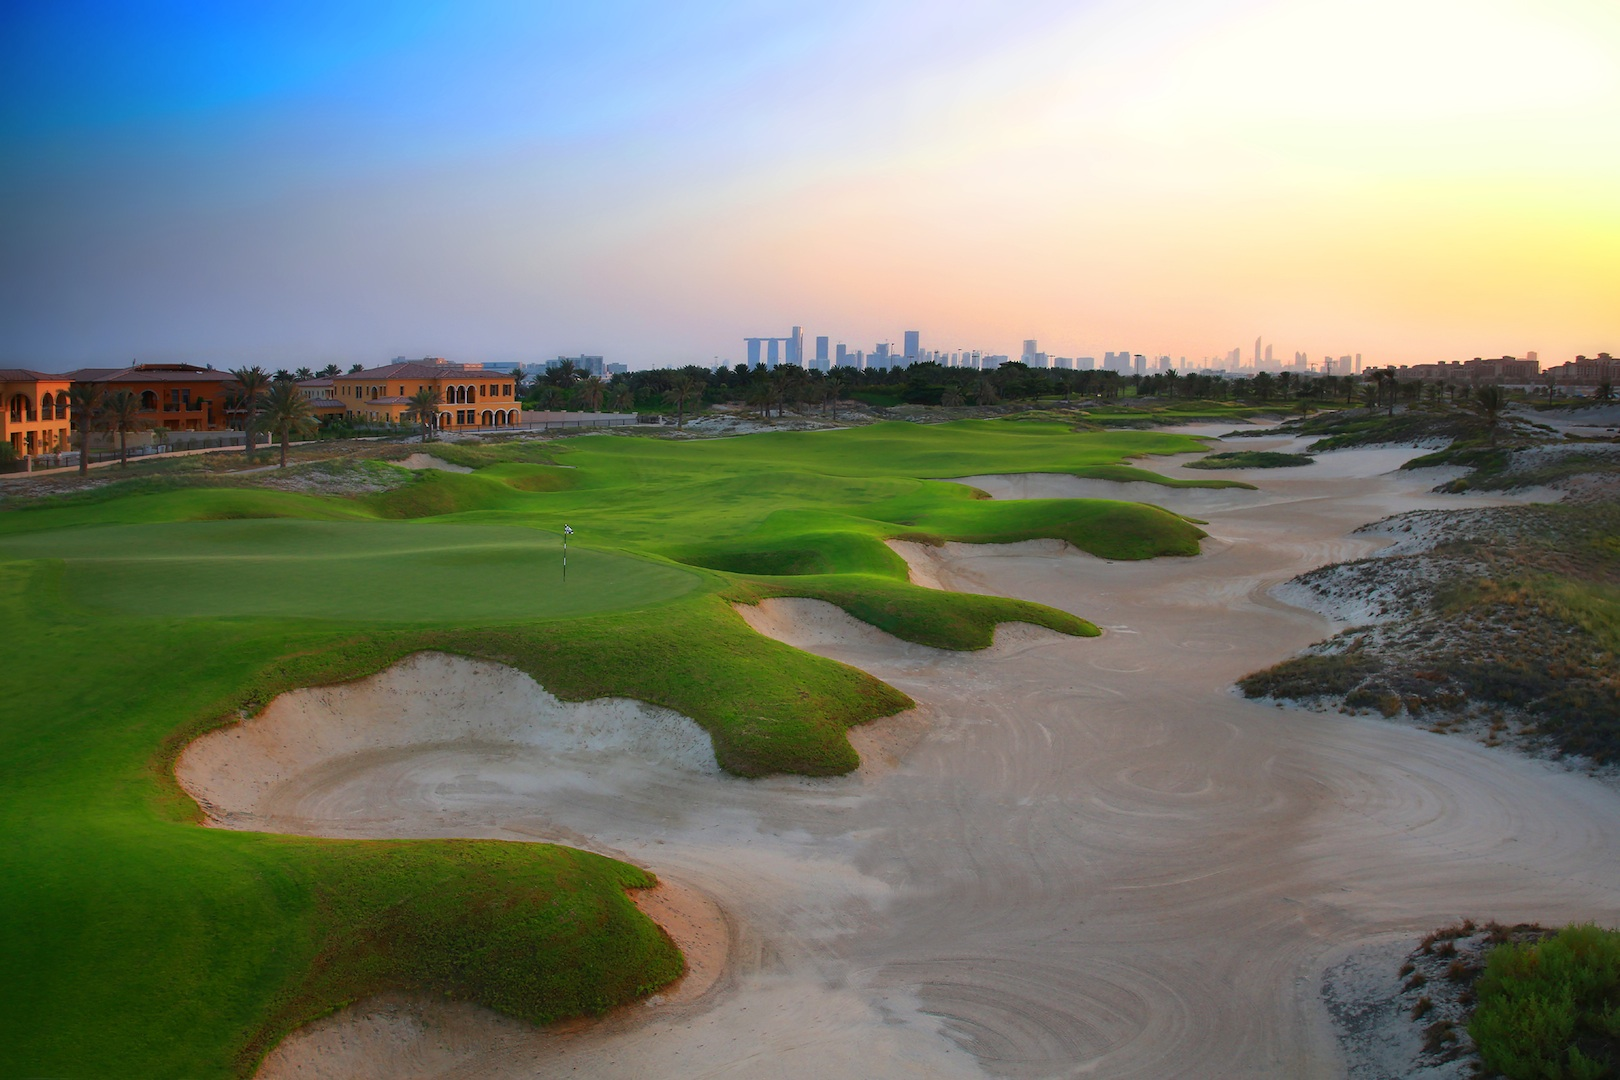 GolfPorn: Saadiyat Beach Golf Course, Abu Dhabi